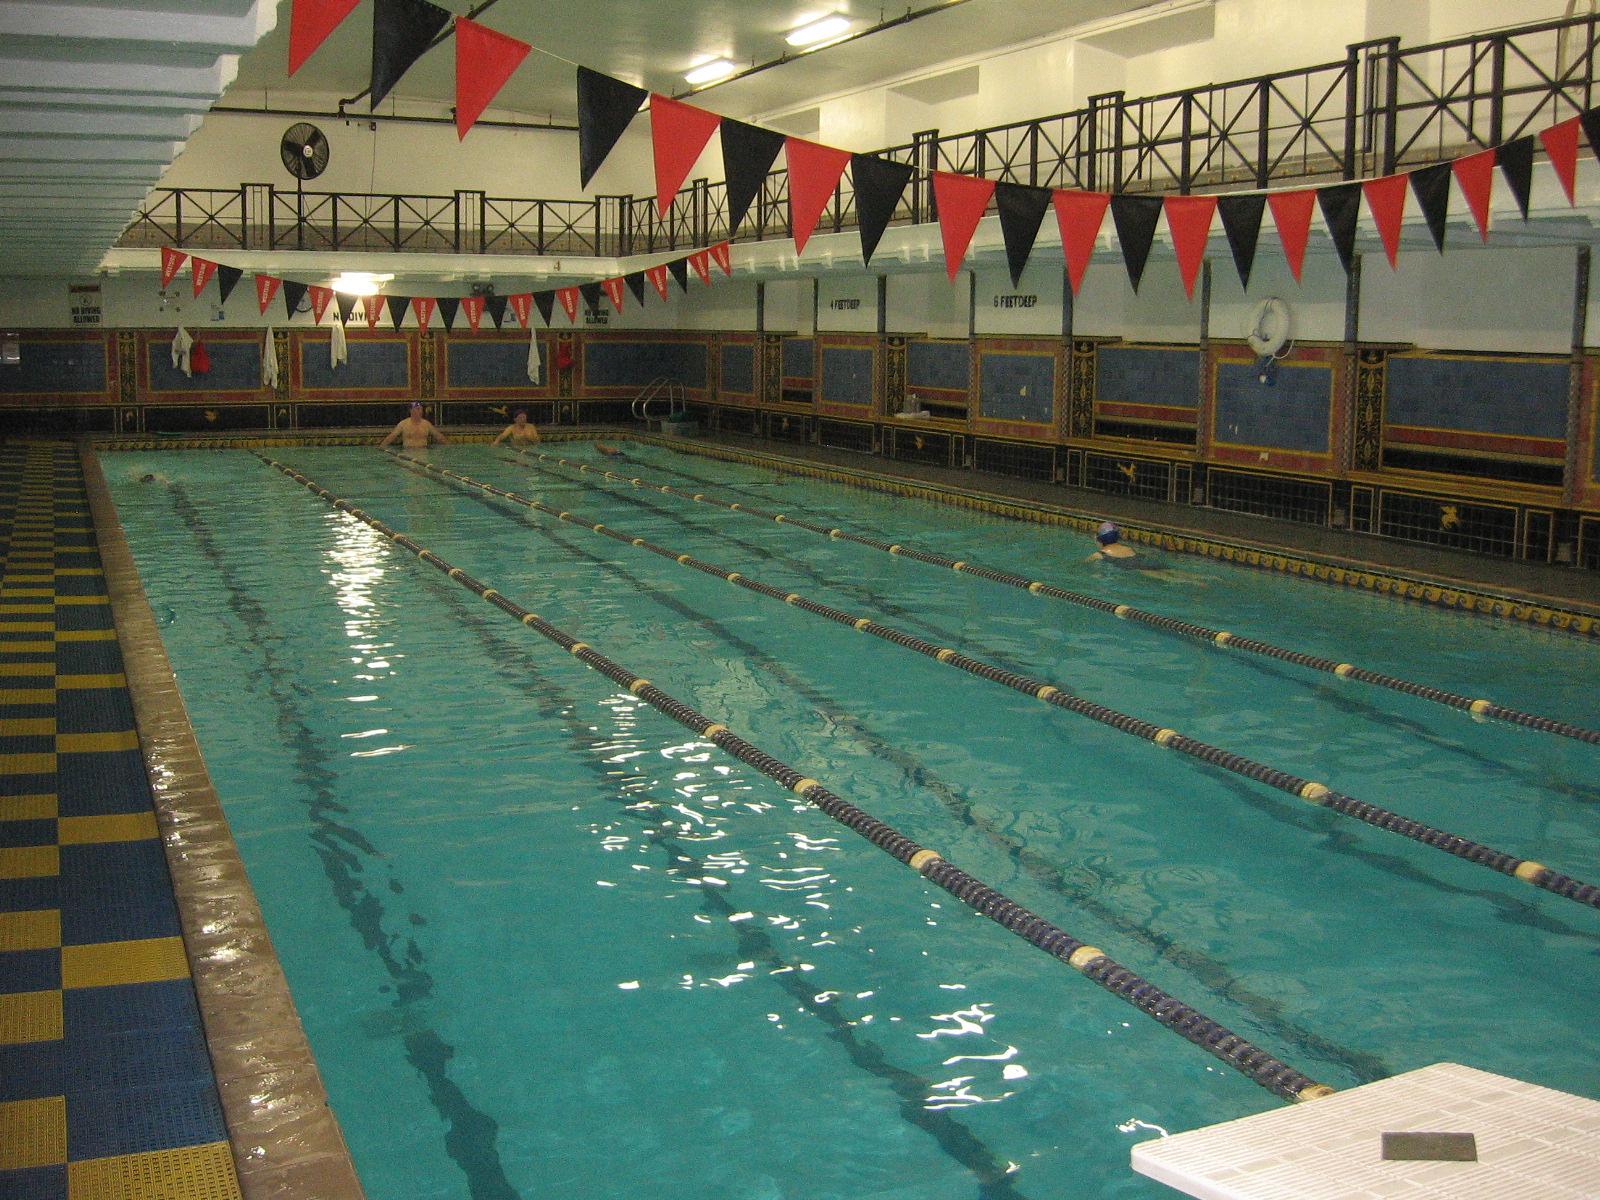 The West Side YMCA (photo courtesy https://40pools.wordpress.com/2012/05/21/27-west-side-ymca-pool/)